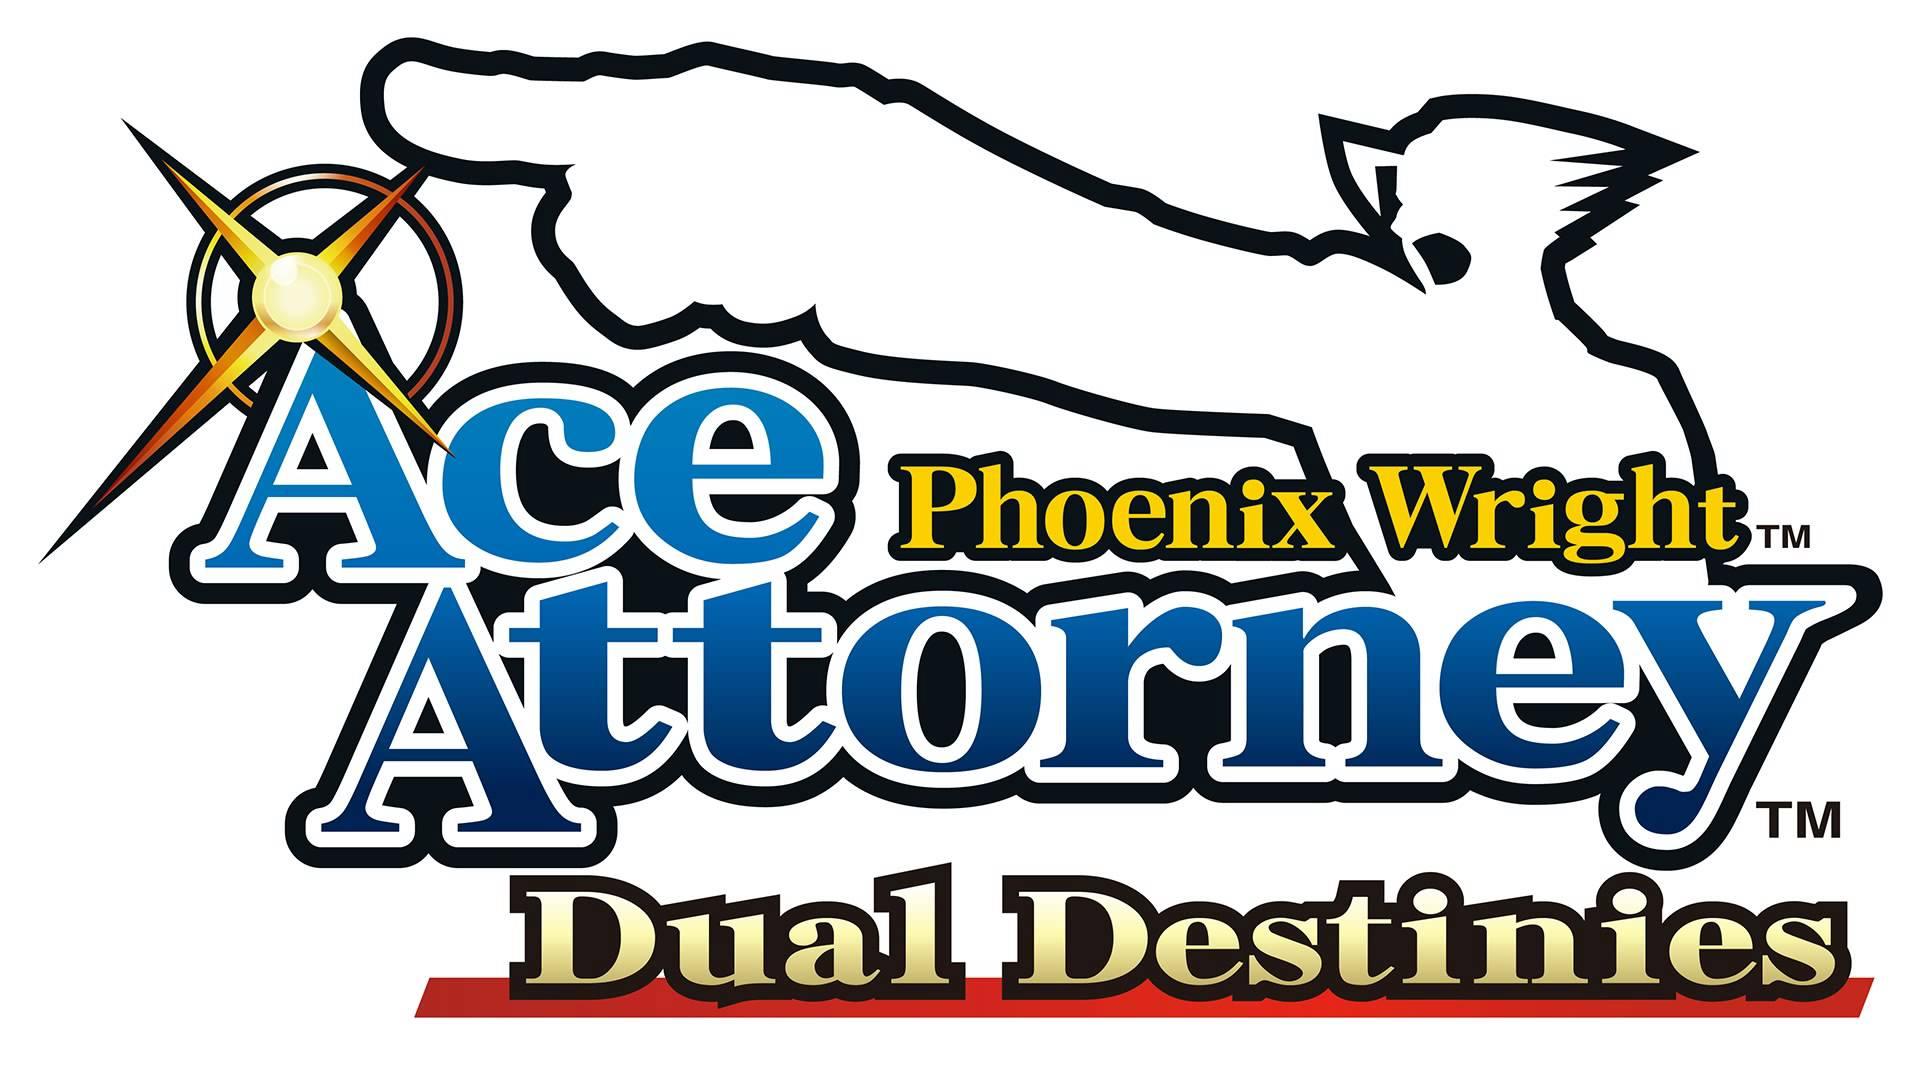 Apollo Justice ~ I'm Fine! - Phoenix Wright: Ace Attorney - Dual Destinies